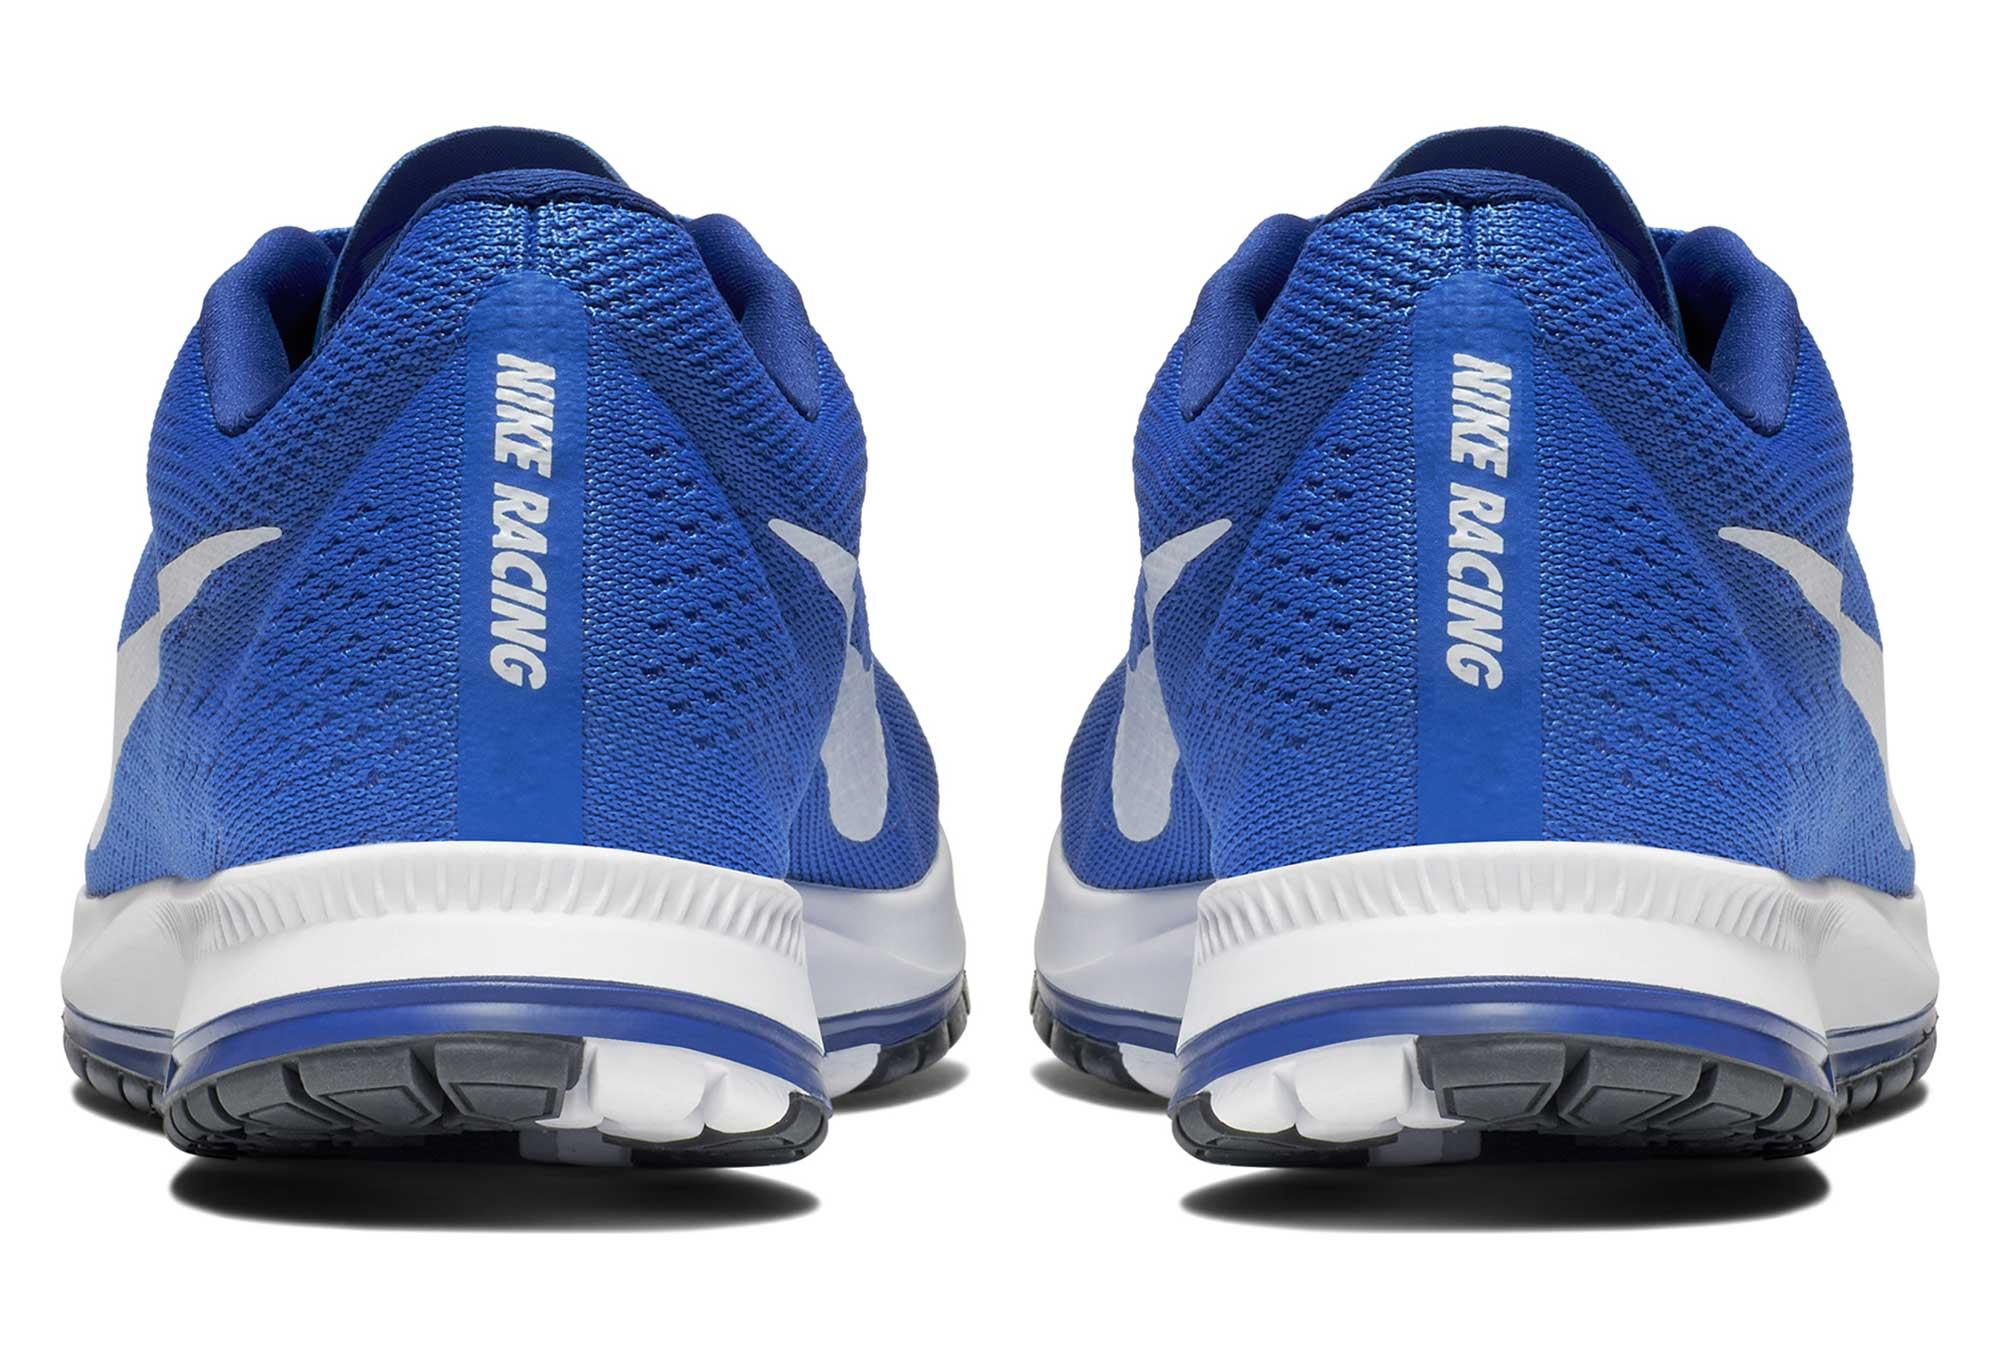 47104915185f0 Nike Air Zoom Streak 6 Blue Unisex